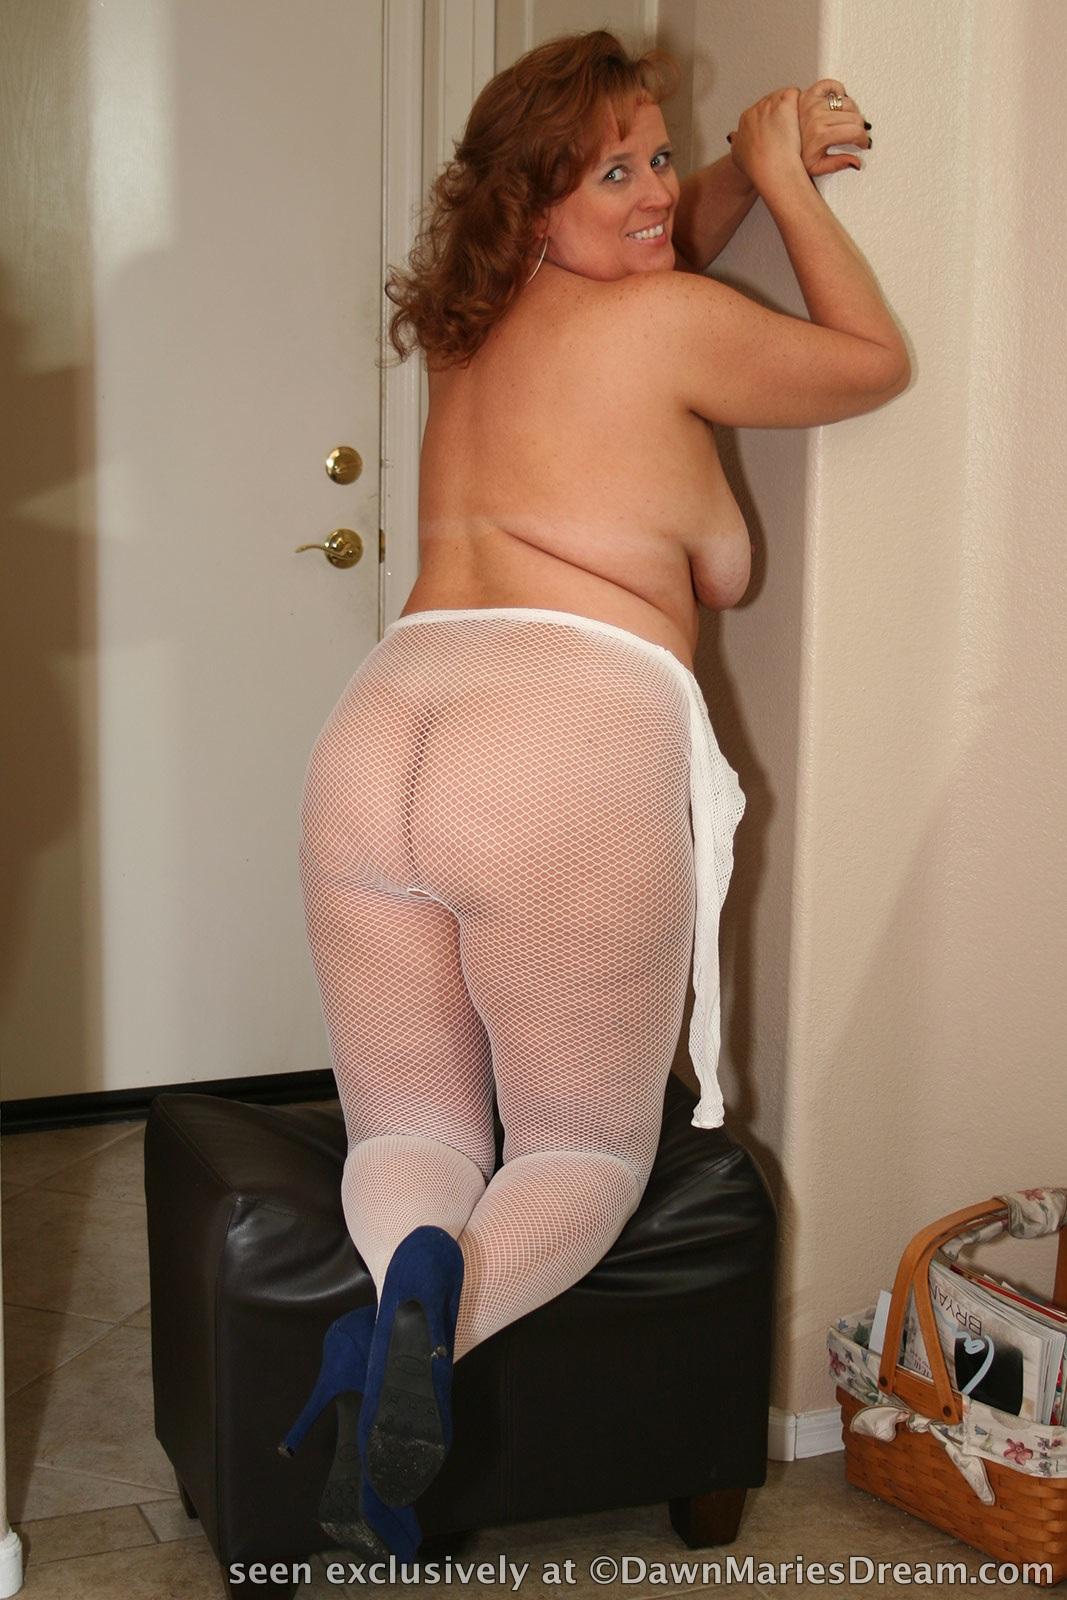 sexy big tit milf dawn marie in a body fishnet body stocking naked at ...: hotgirlhdwallpaper.com/dawn/dawn-maries-dream.html